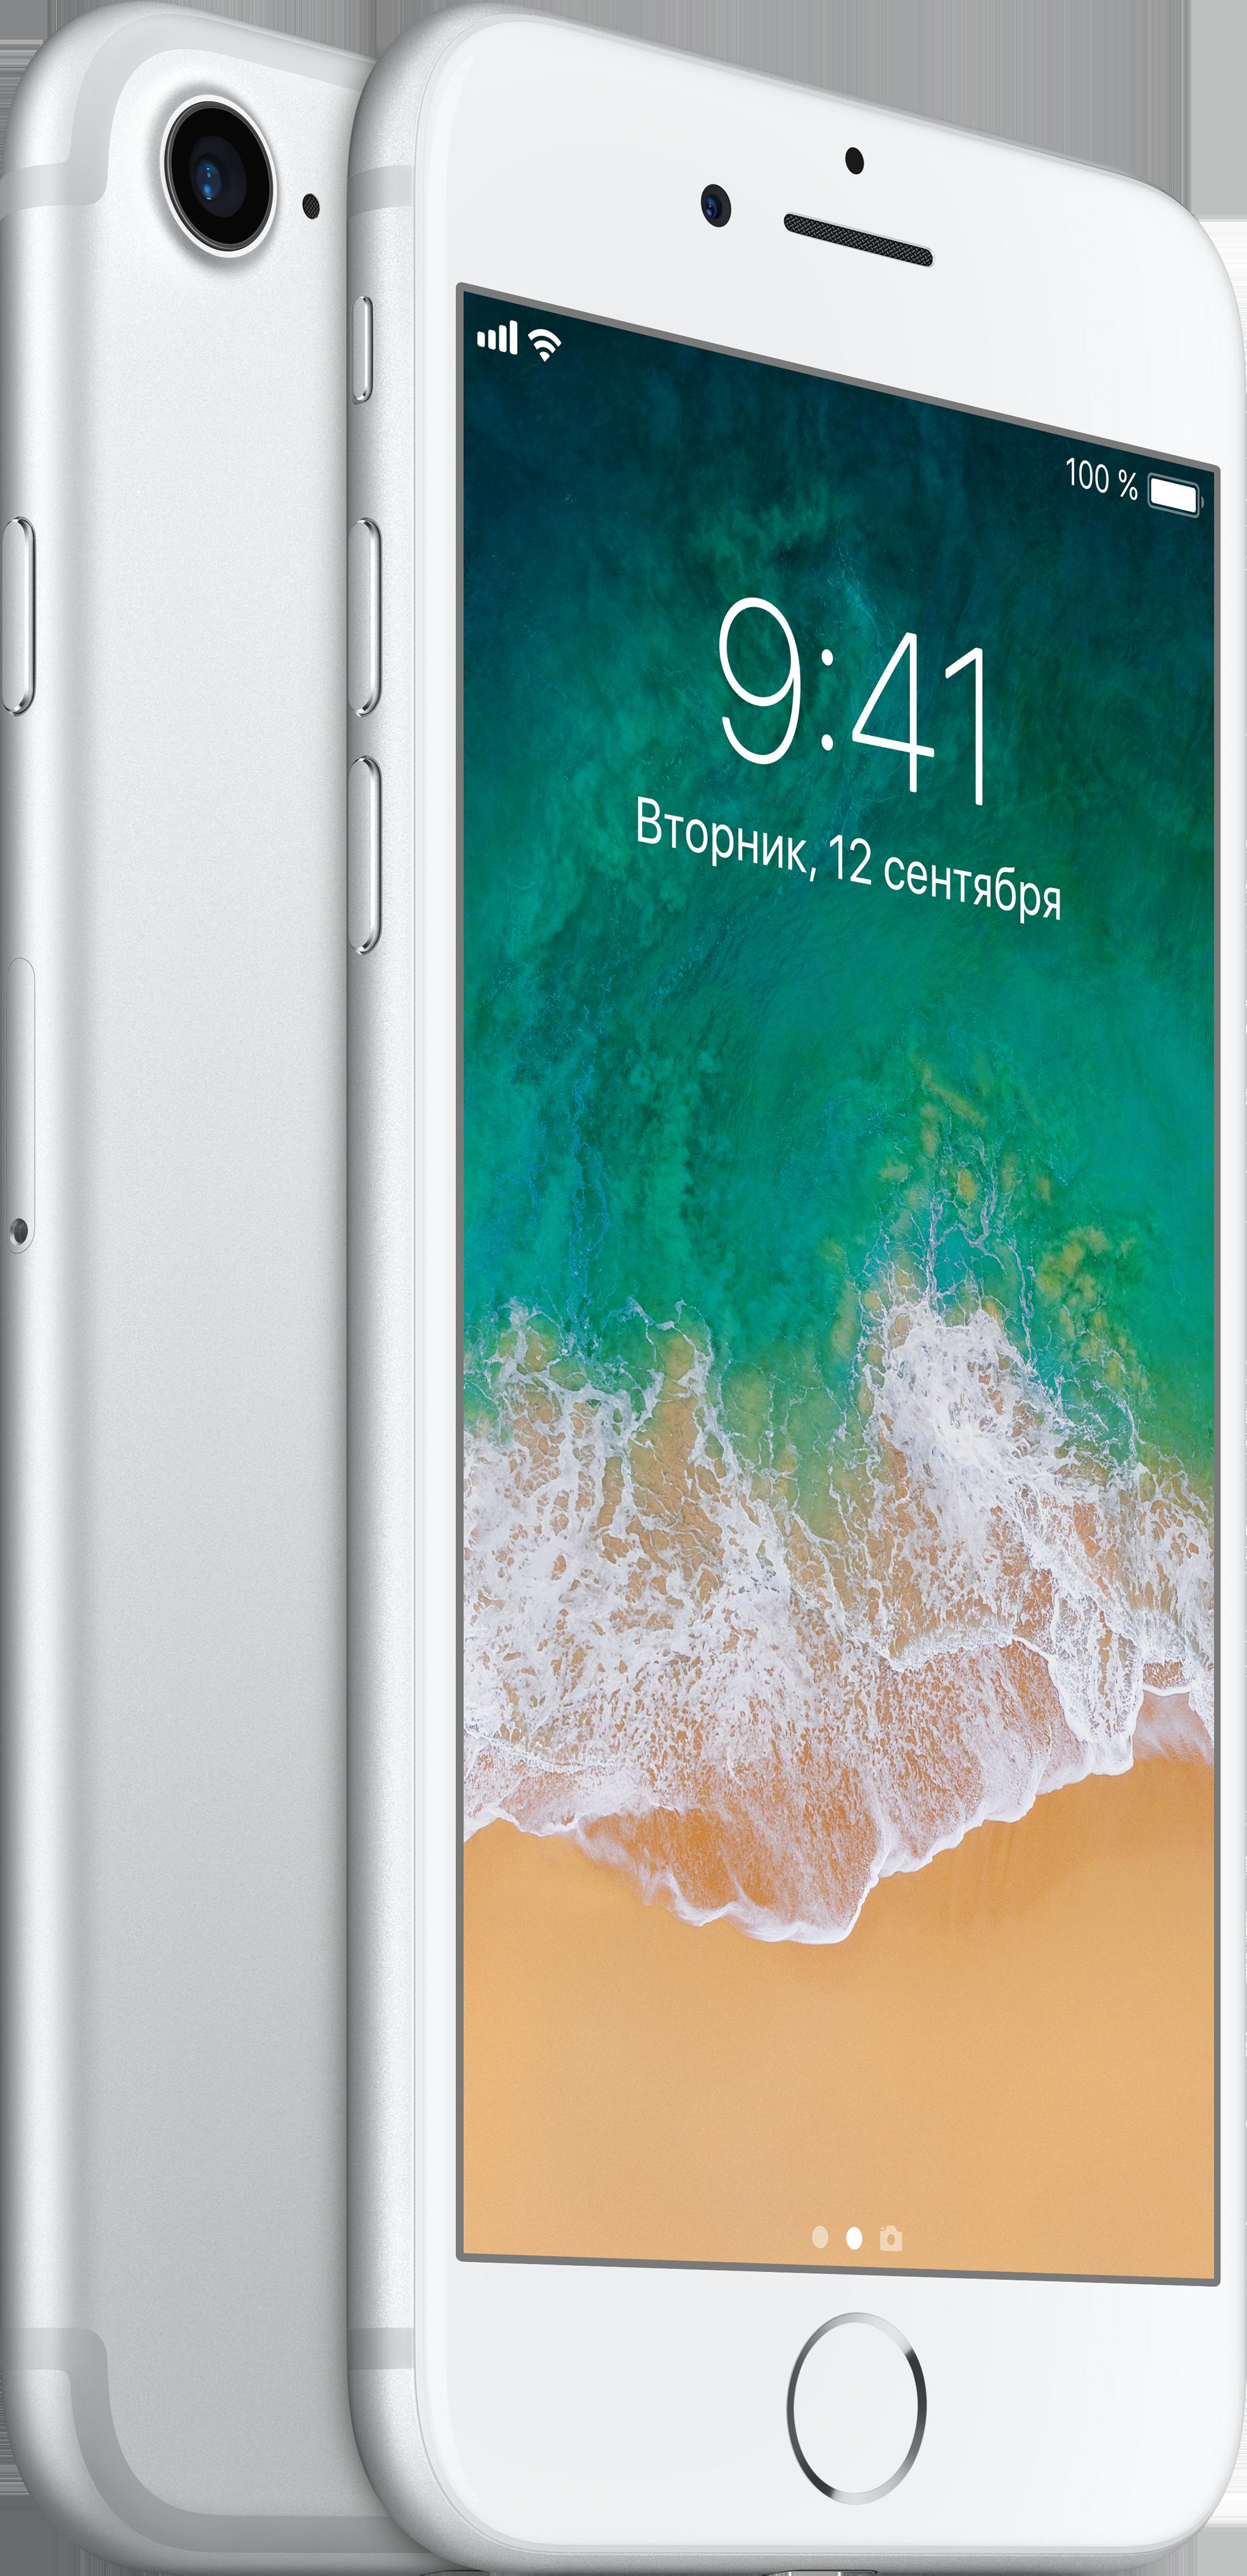 iPhone 7, 32 ГБ, Серебристый